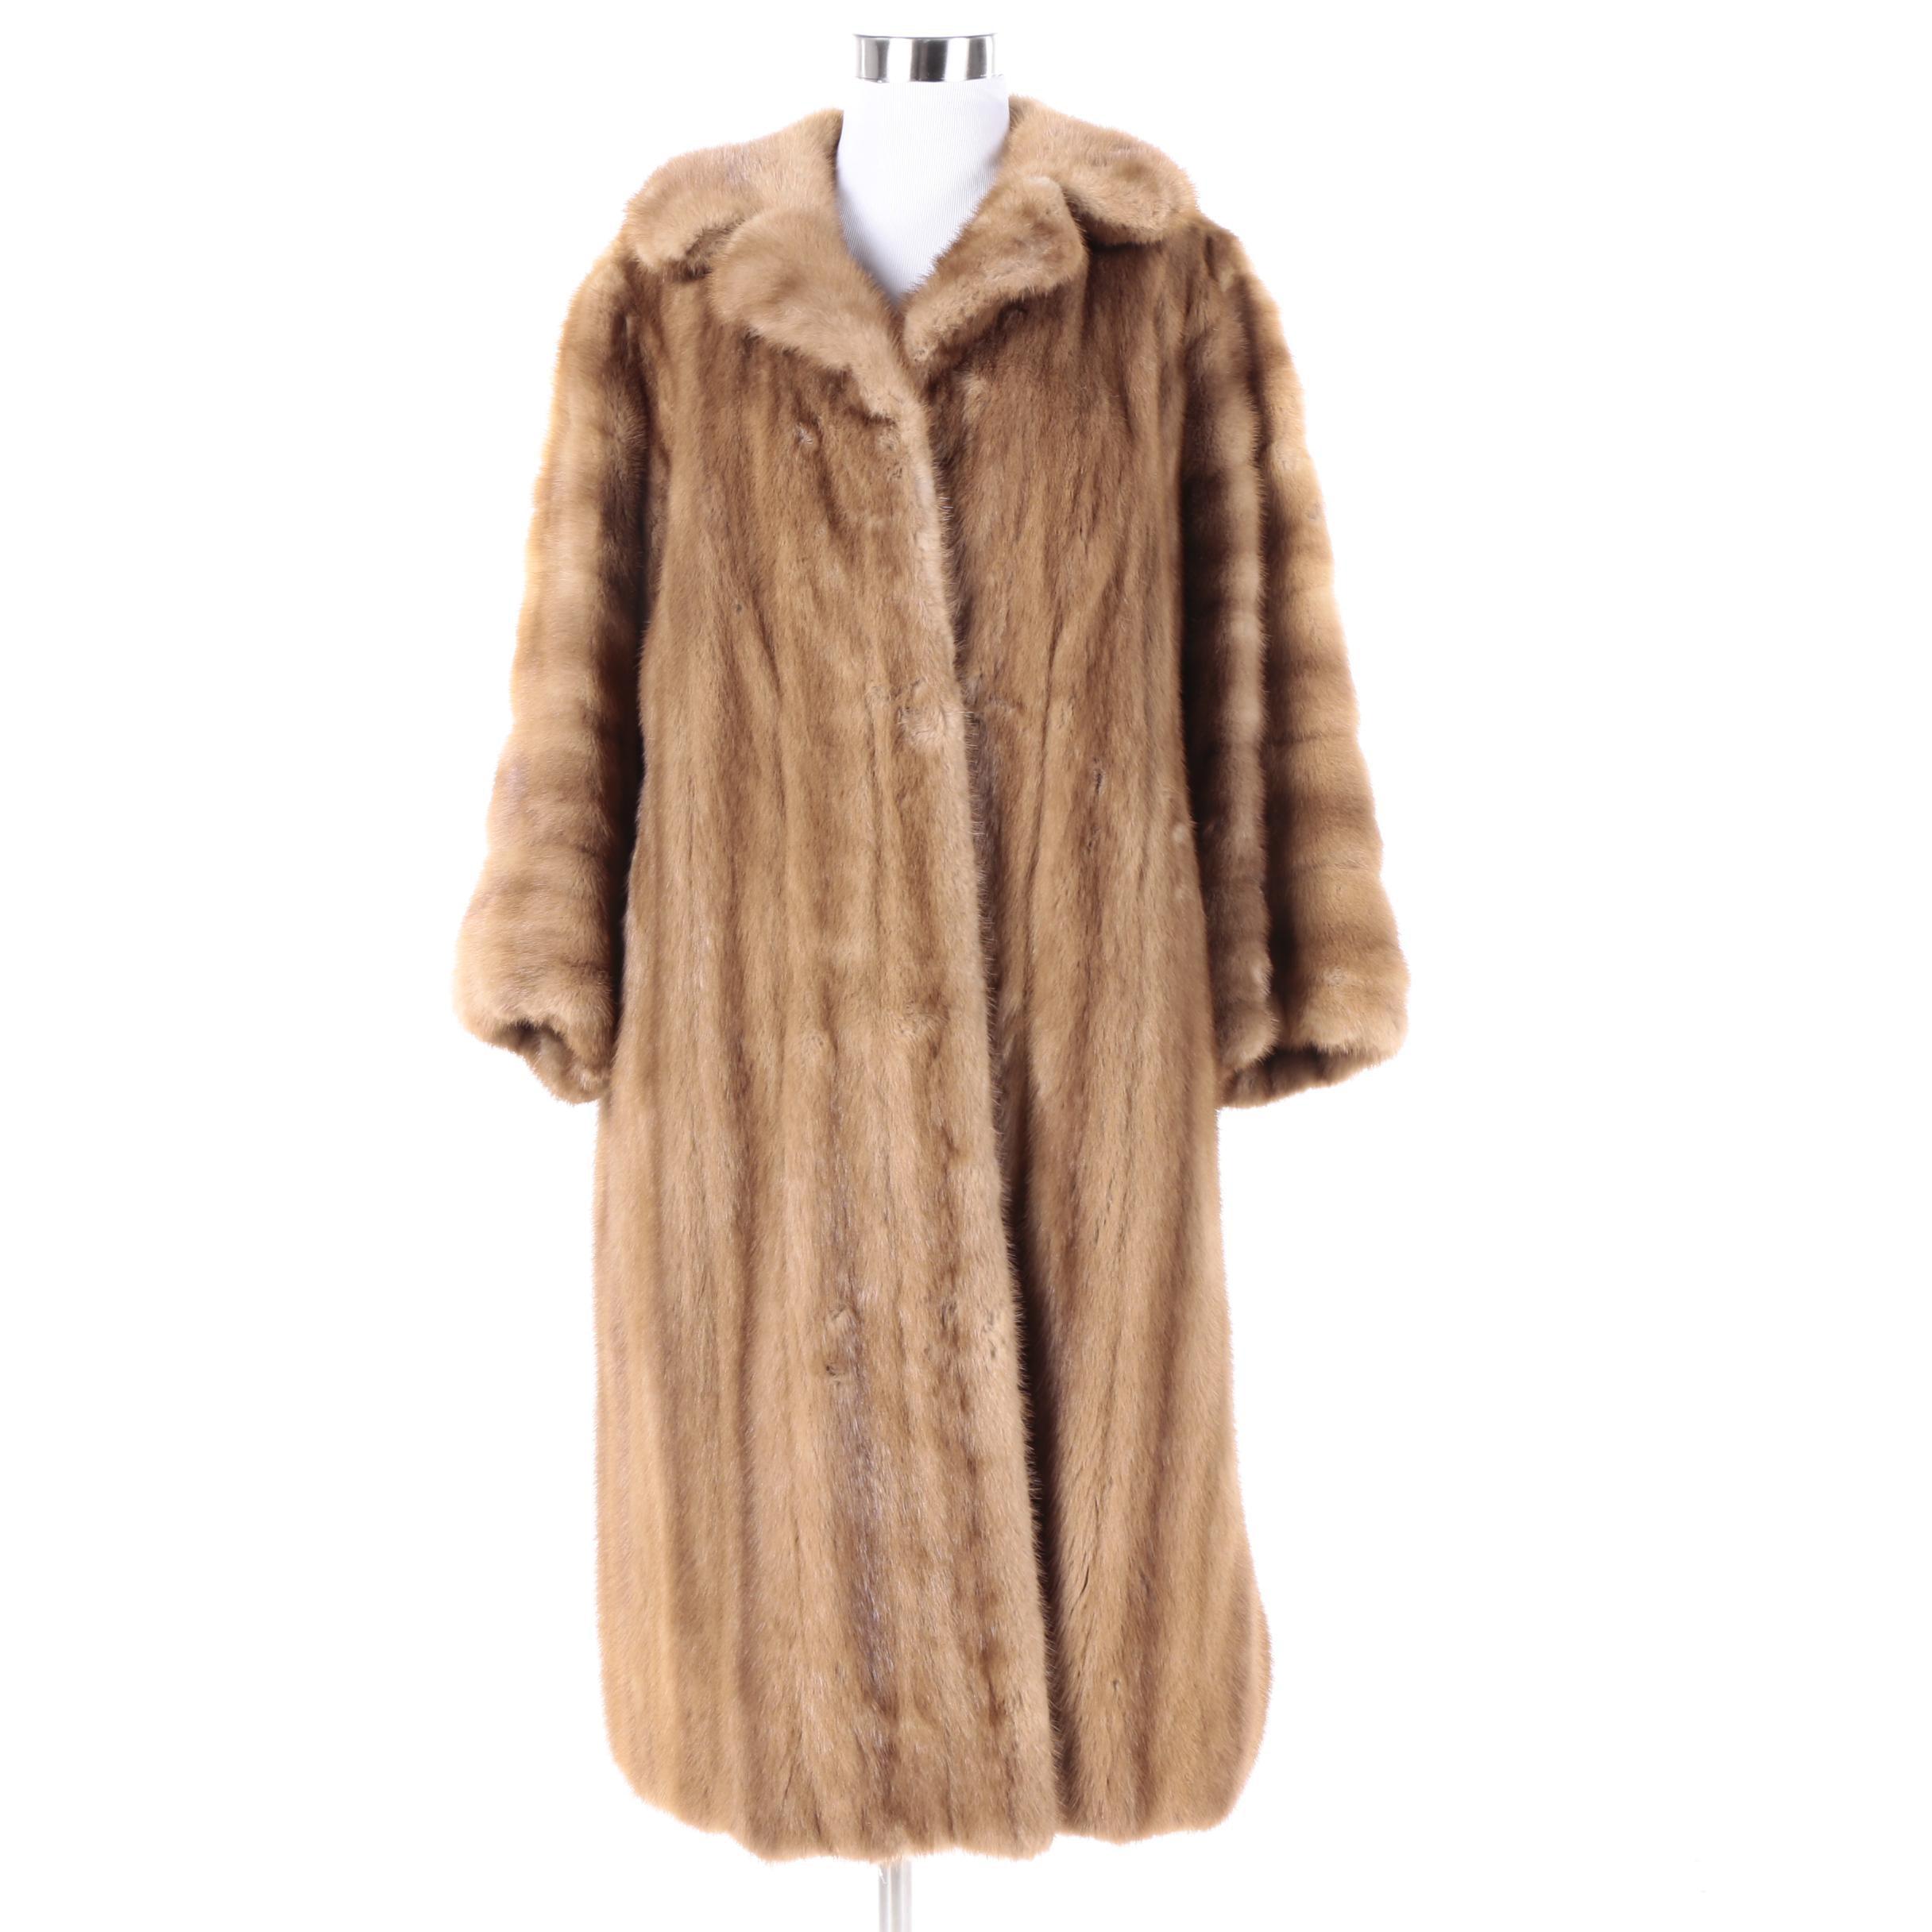 Women's Vintage Paul Klink Furs Mink Fur Coat